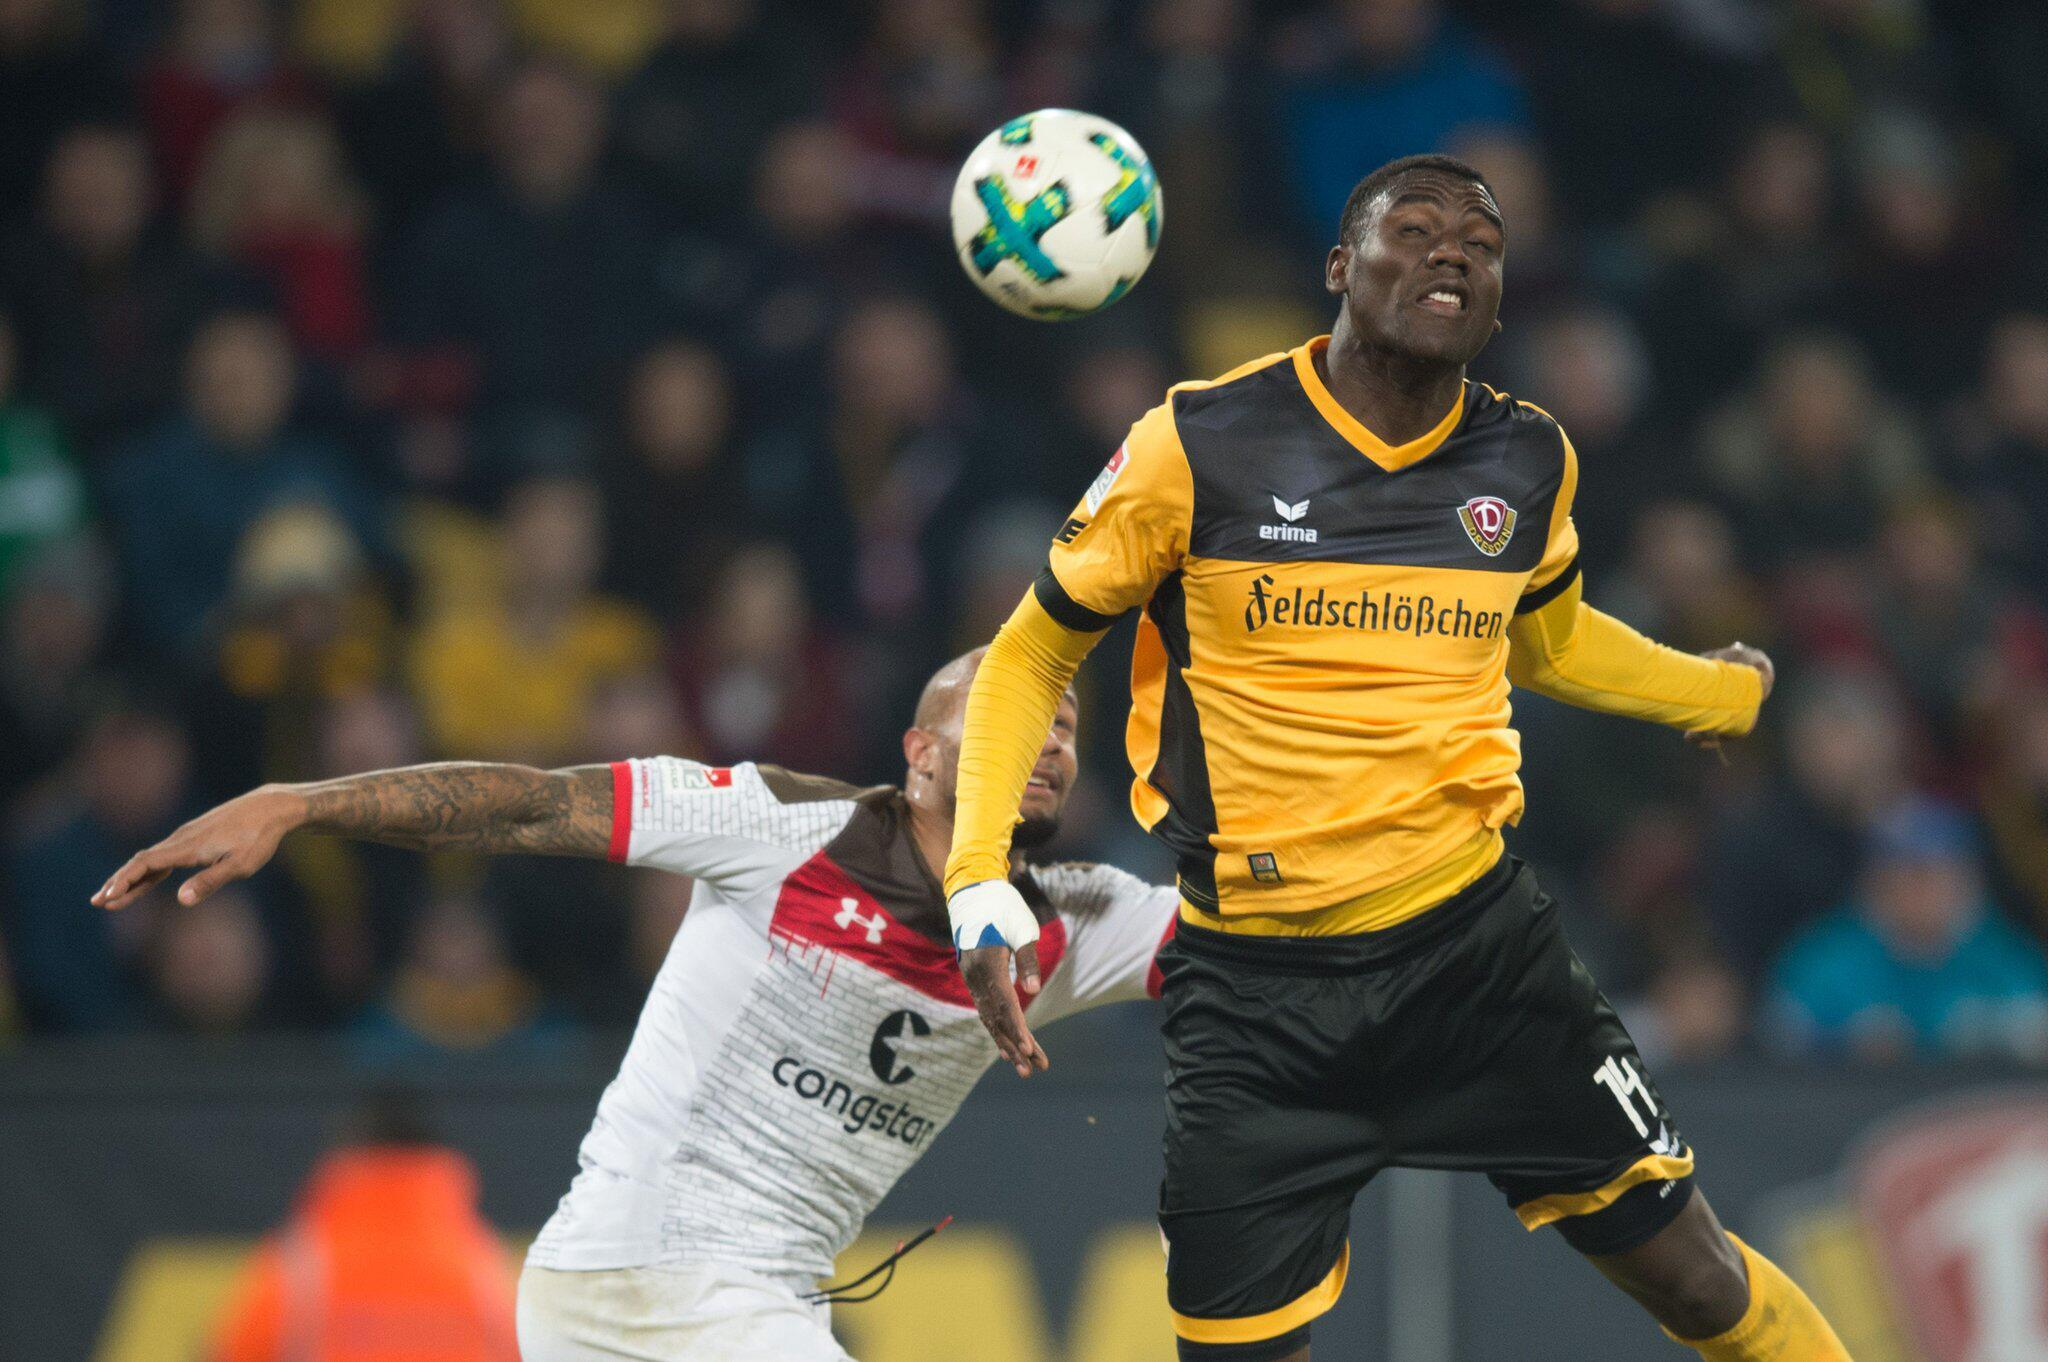 Bild zu Dynamo Dresden - FC St. Pauli